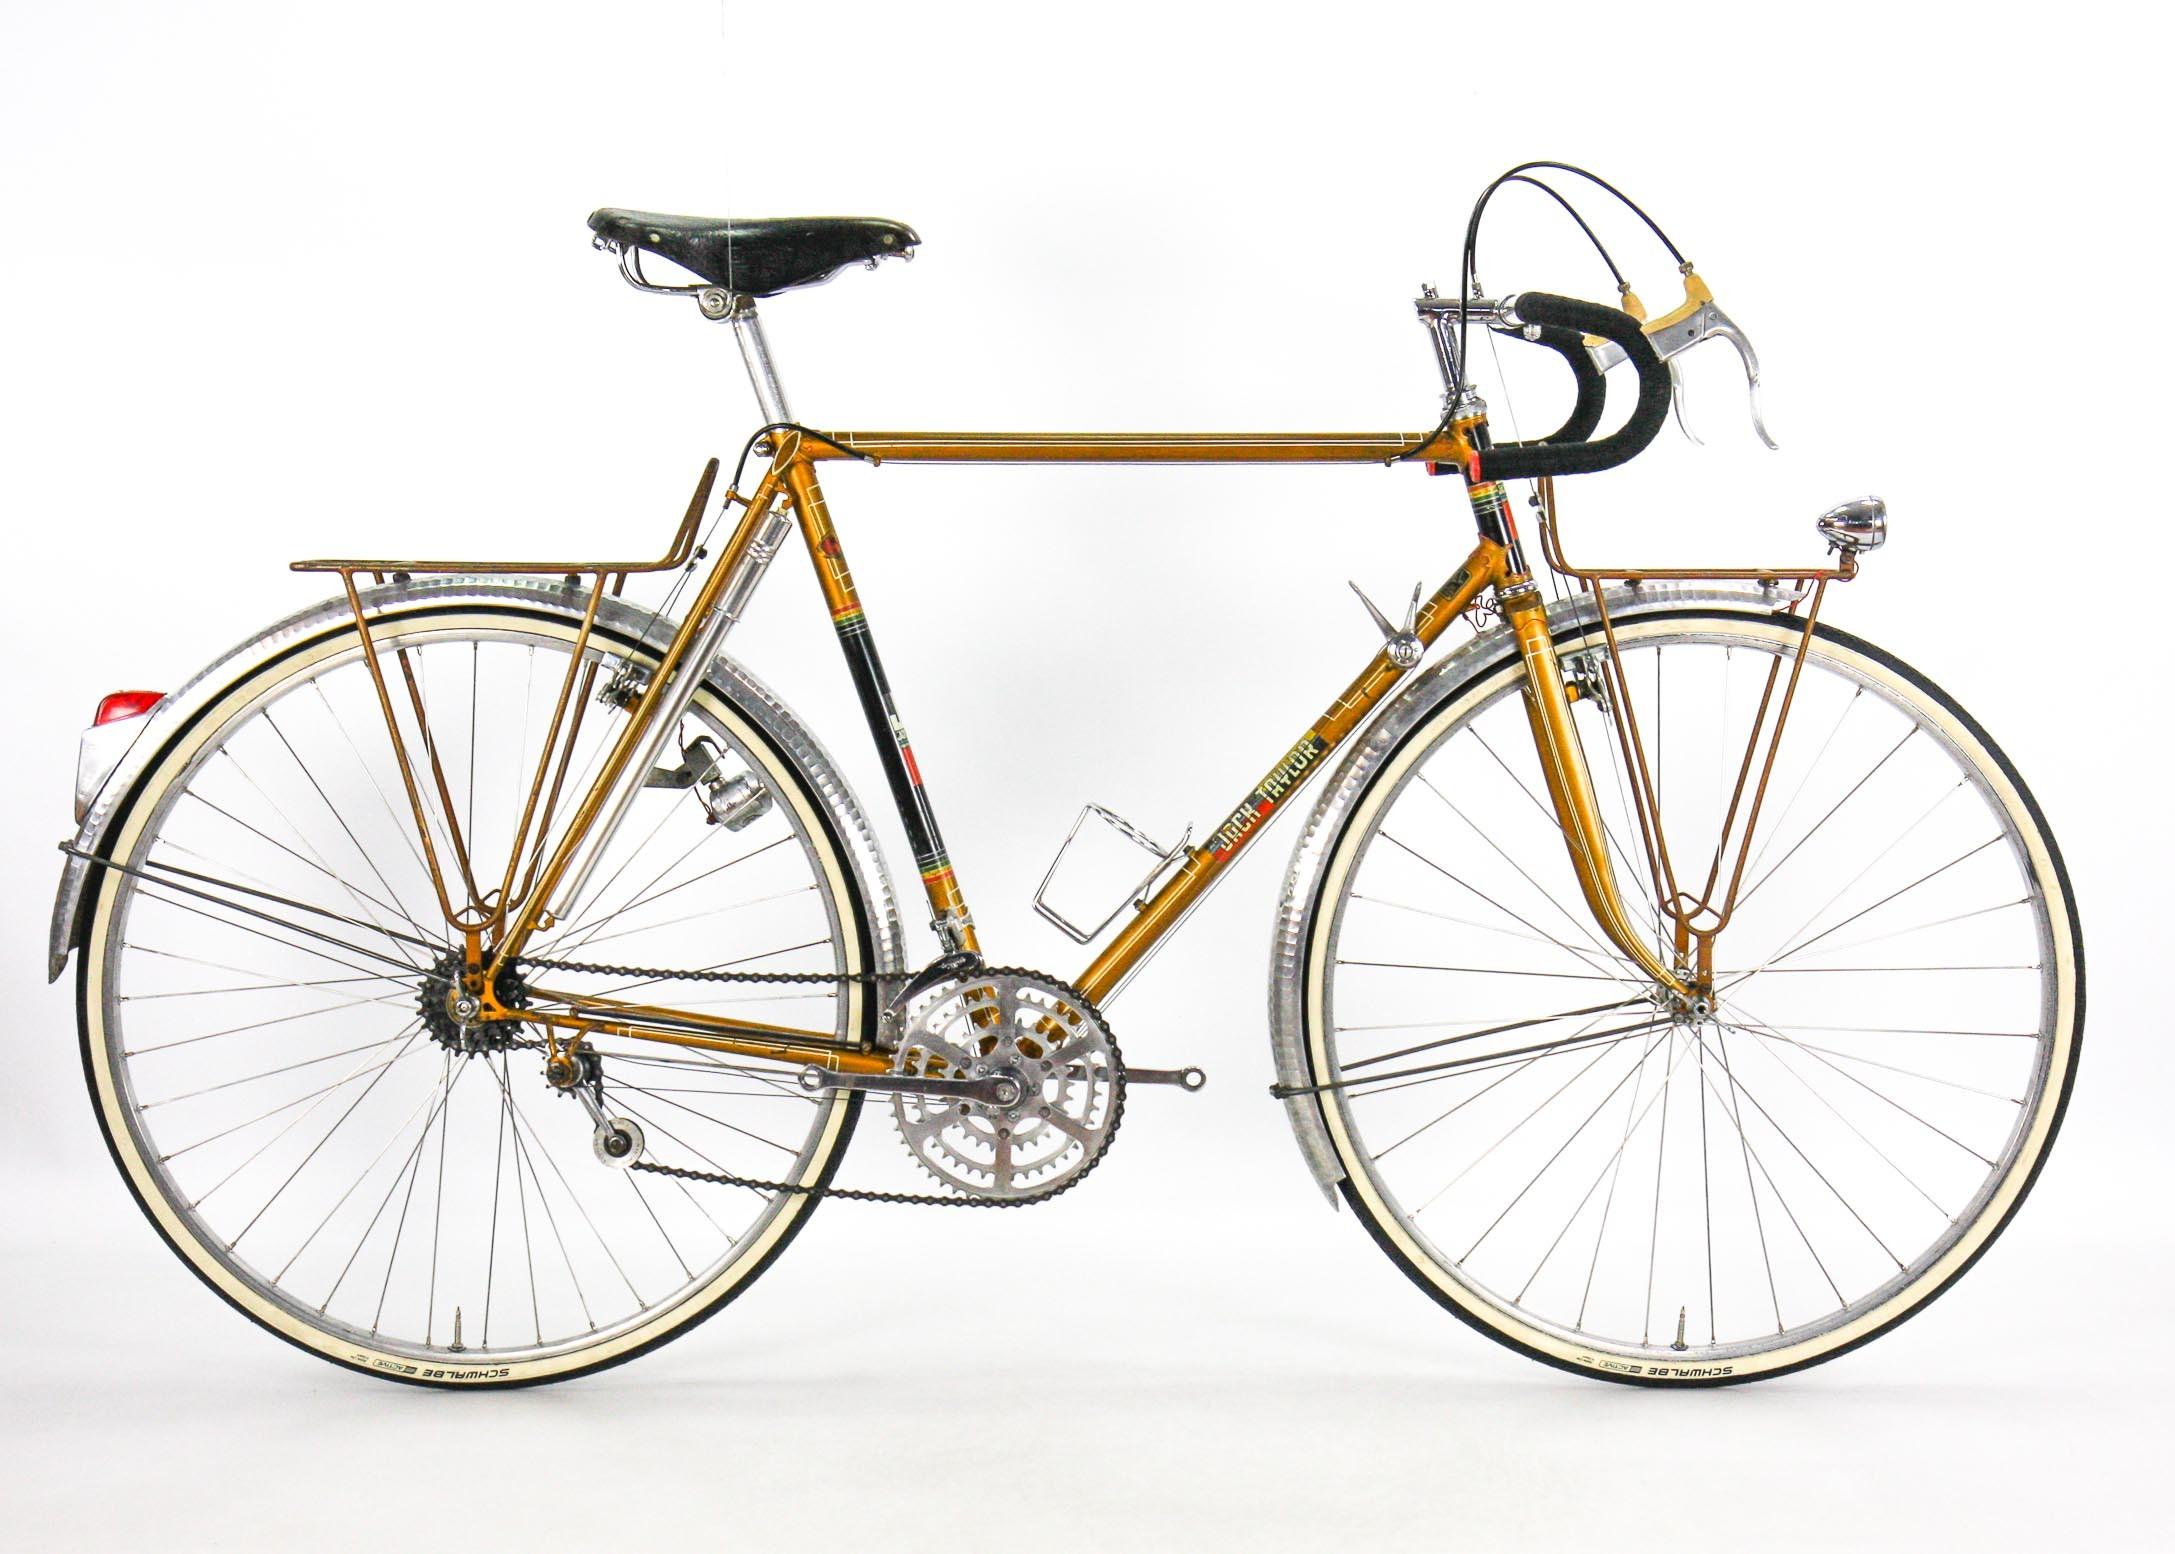 Steel Vintage Bikes - Jack Taylor Tourist Classic Touring Bike 1962